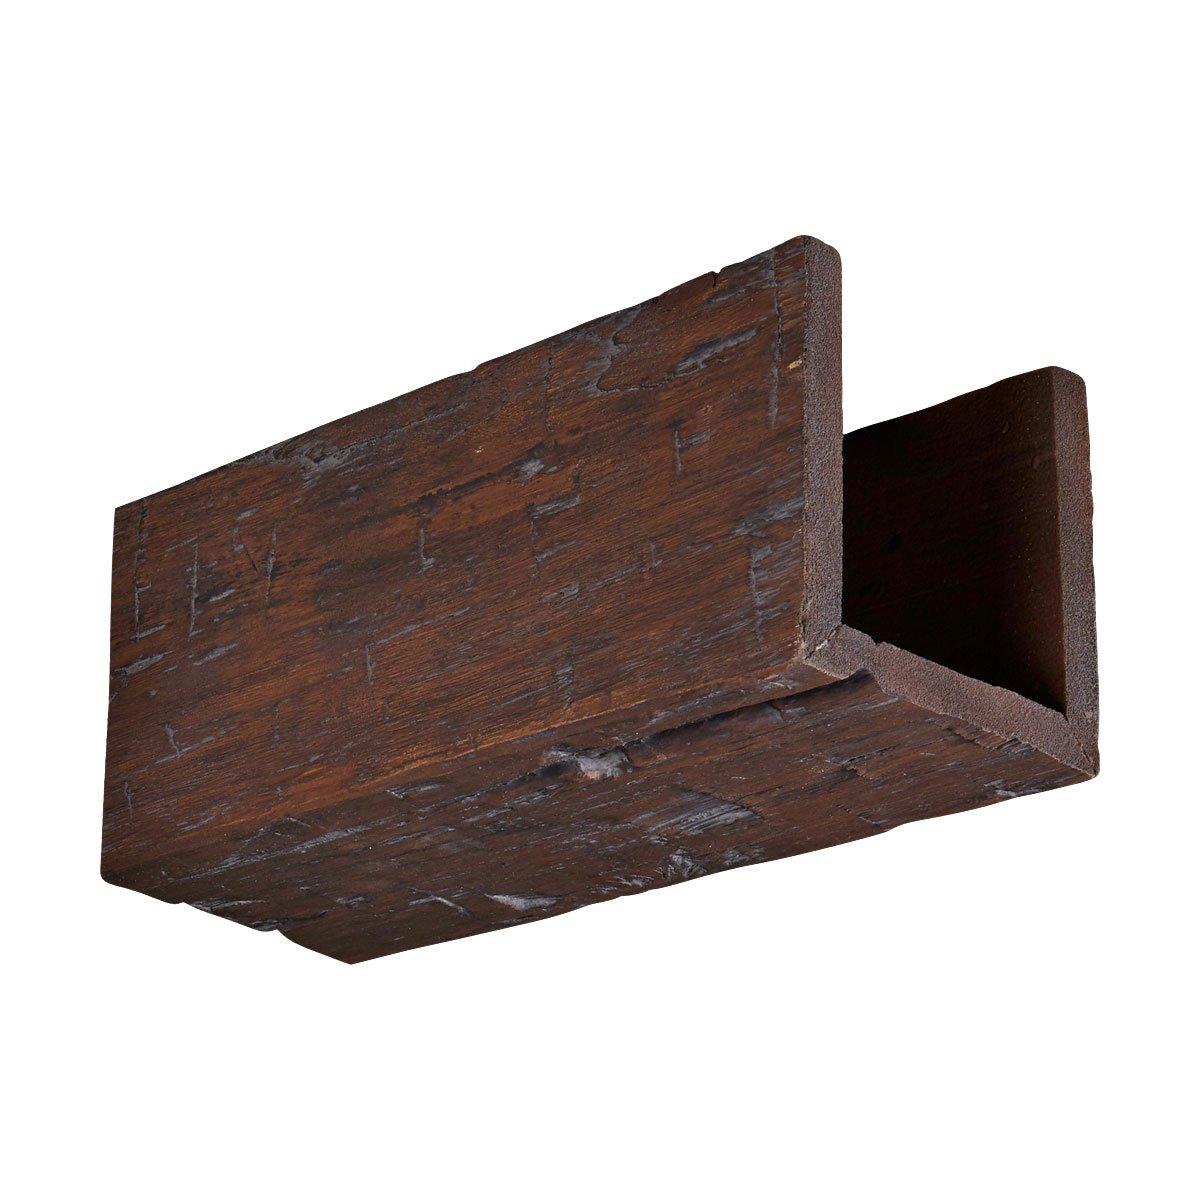 Ekena Millwork BMHHBC-SAMPLE Faux Wood Beams, 6'' x 6'' x 12'', Black Cherry